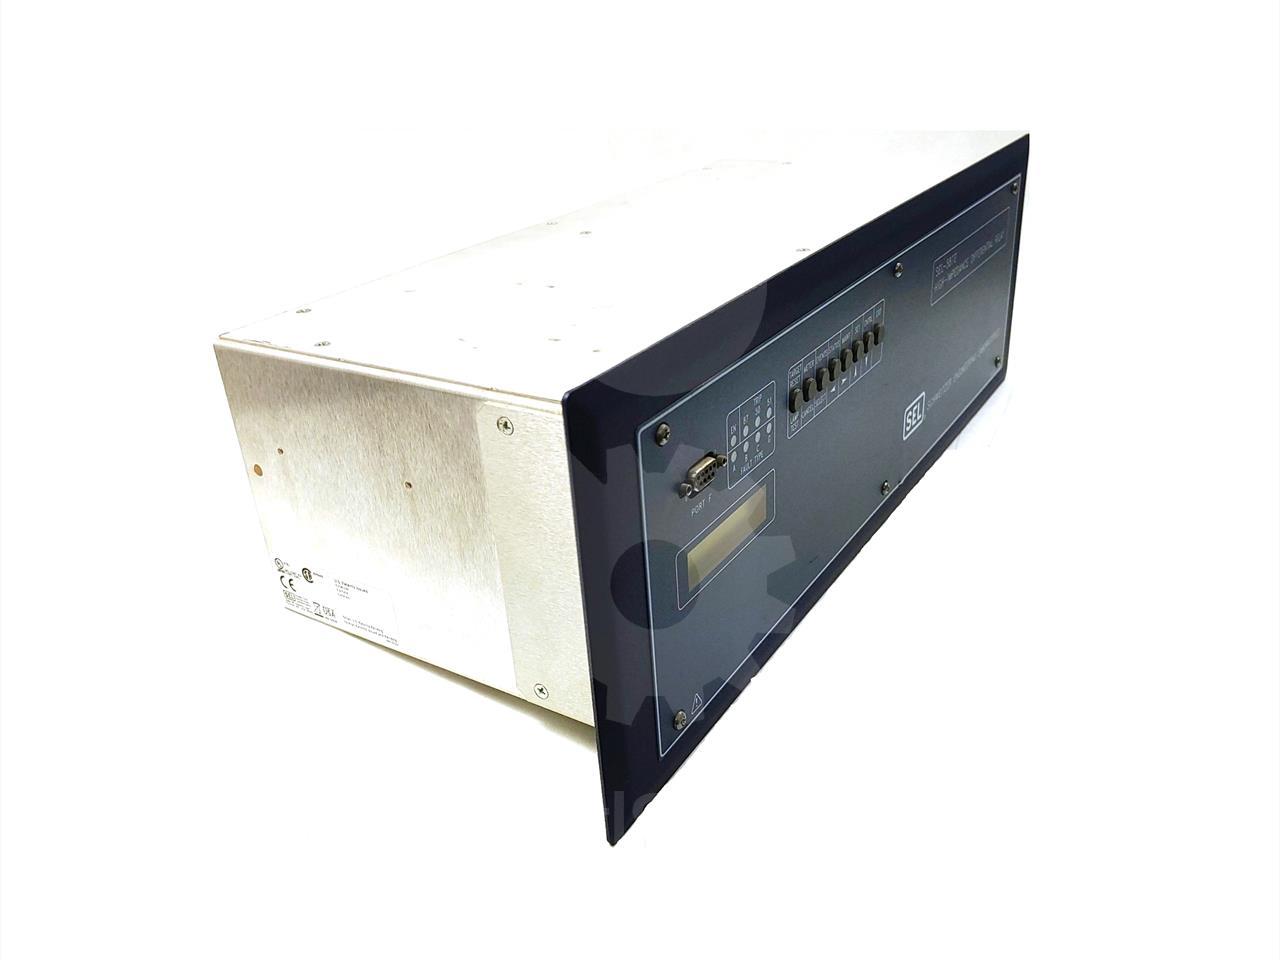 Schweitzer 0587z0x325312xx Sel 587z Protection Relay Unused Current Sensing Nz